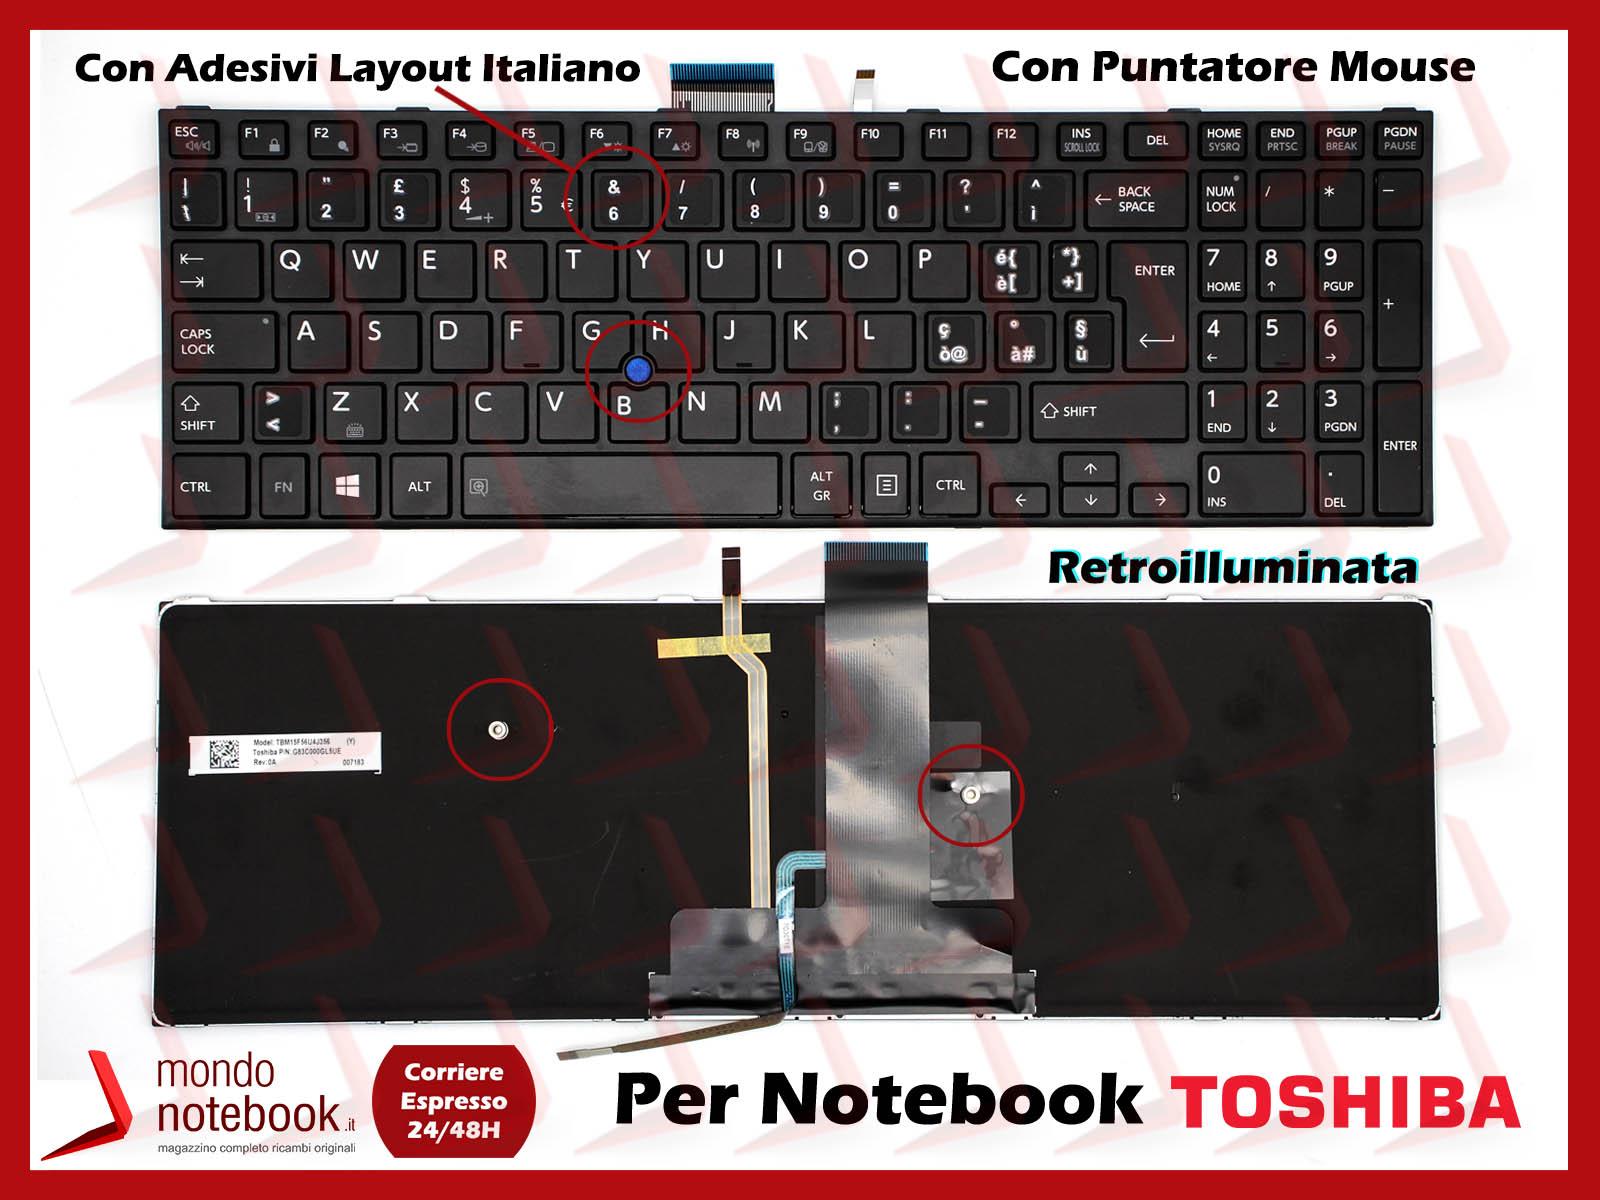 https://www.mondonotebook.it/2399/tastiera-notebook-toshiba-tecra-a50-c-nera-con-adesivi-layout-ita.jpg